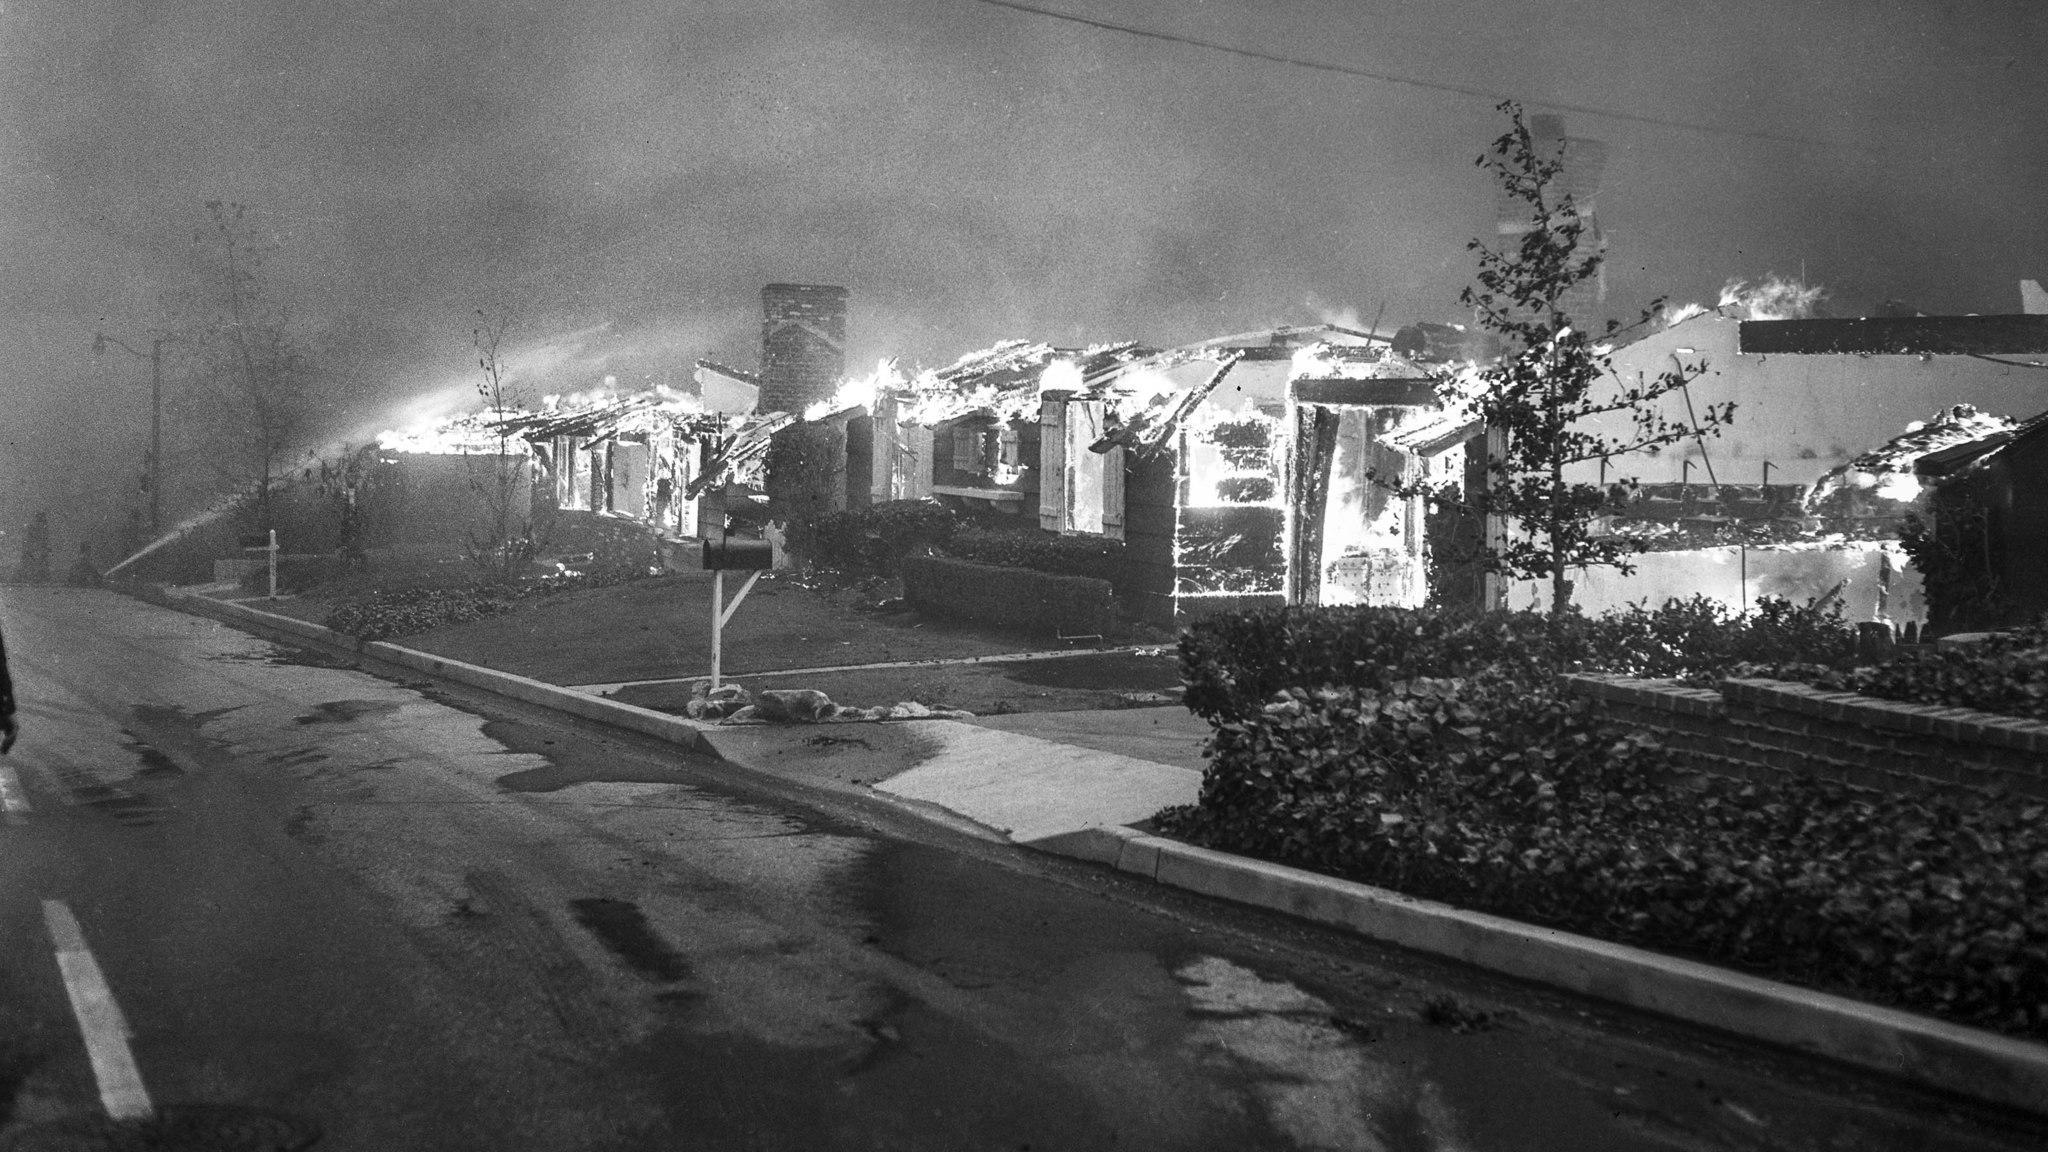 la-me-fw-archives-the-1961-bel-air-brush-fire-20170419